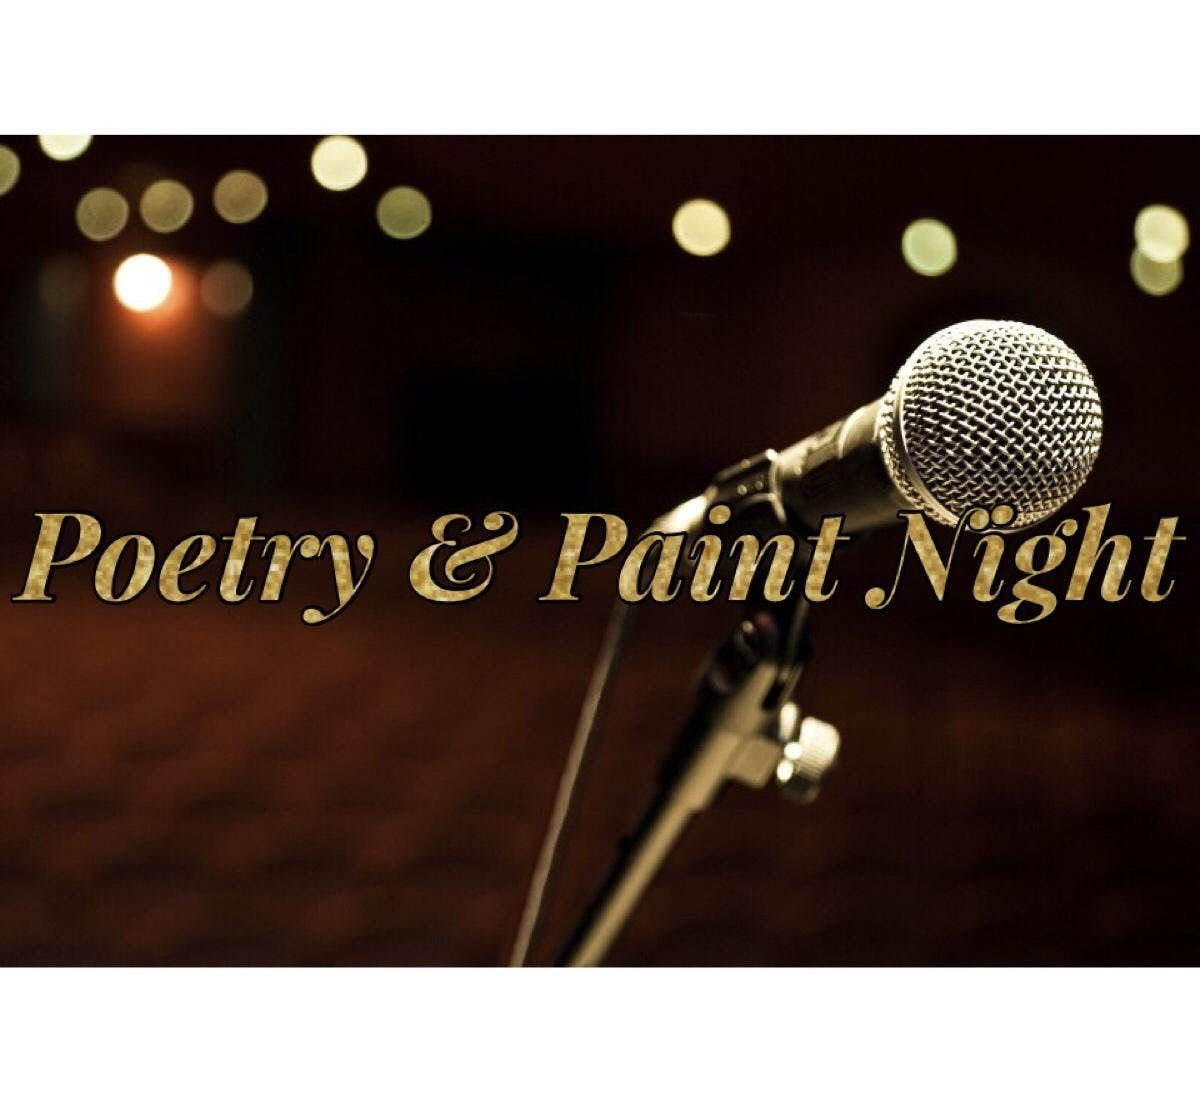 Poetry & Paint Night